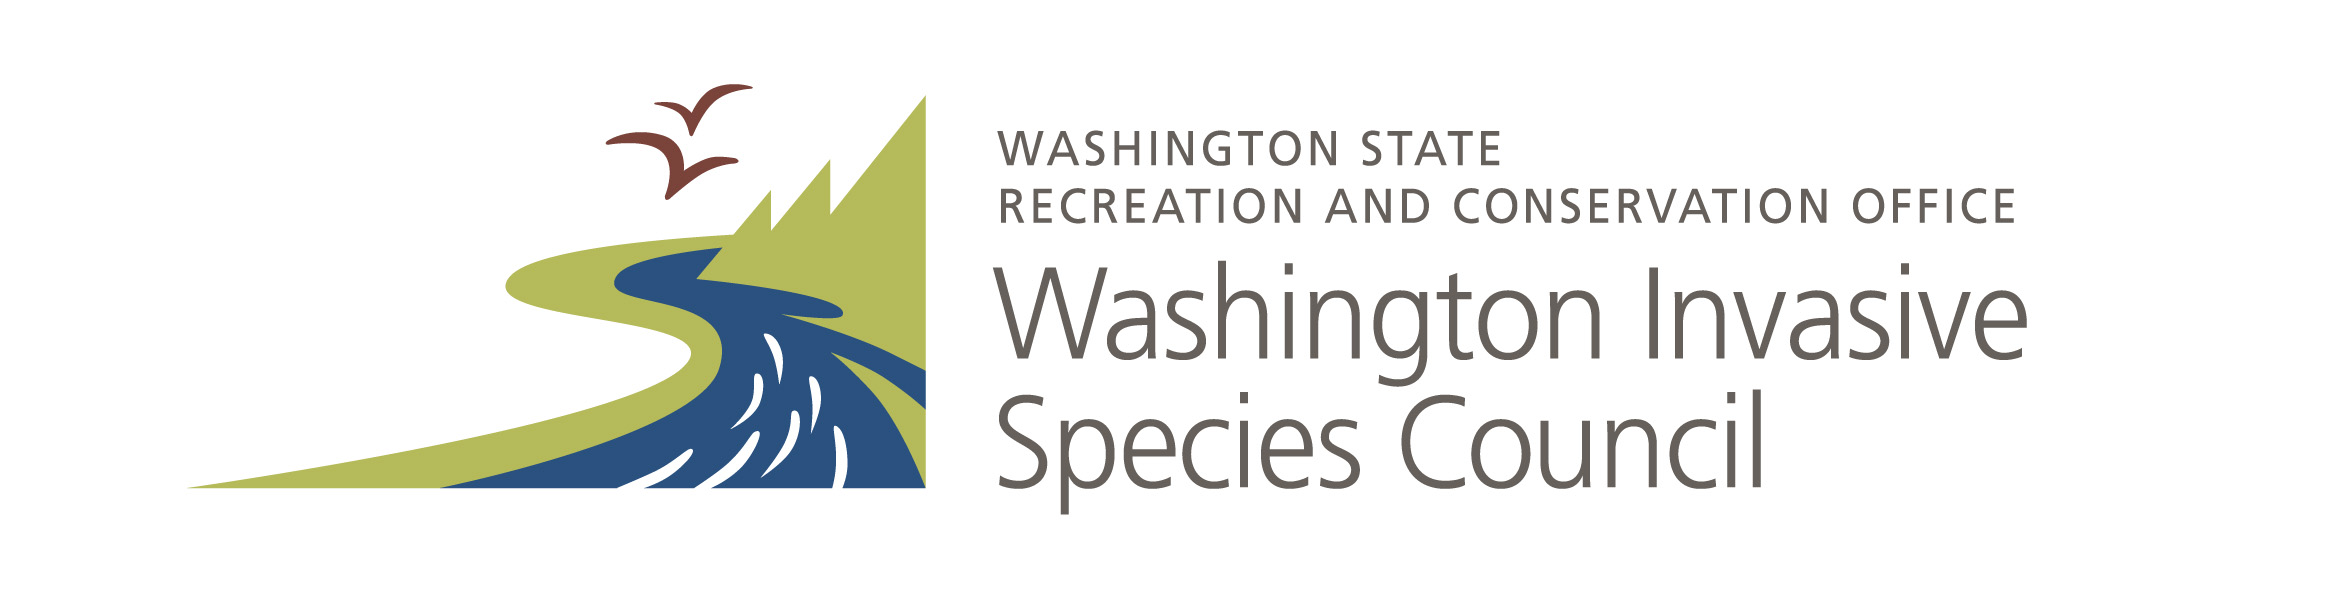 Washington Invasive Species Council